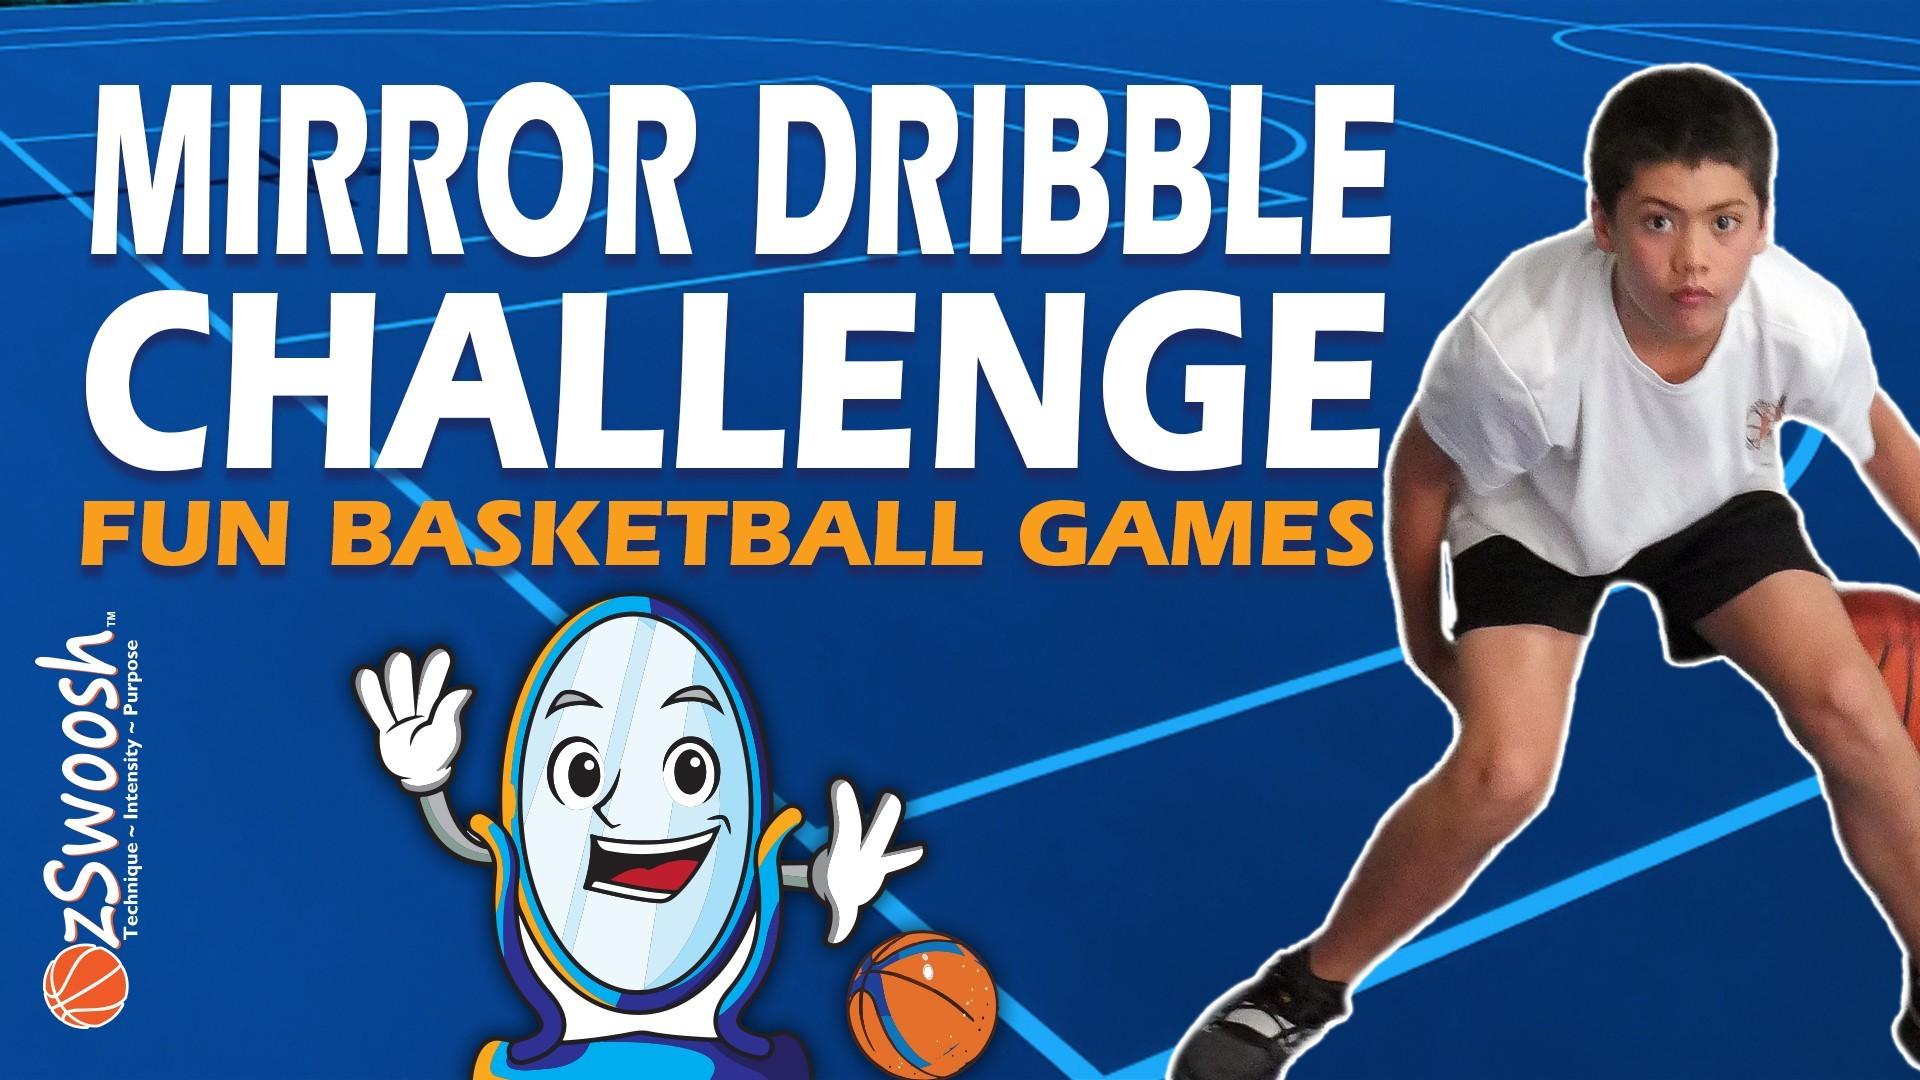 Fun Youth Basketball Games For Kids - Mirror Dribbling (Ball Handling Game)